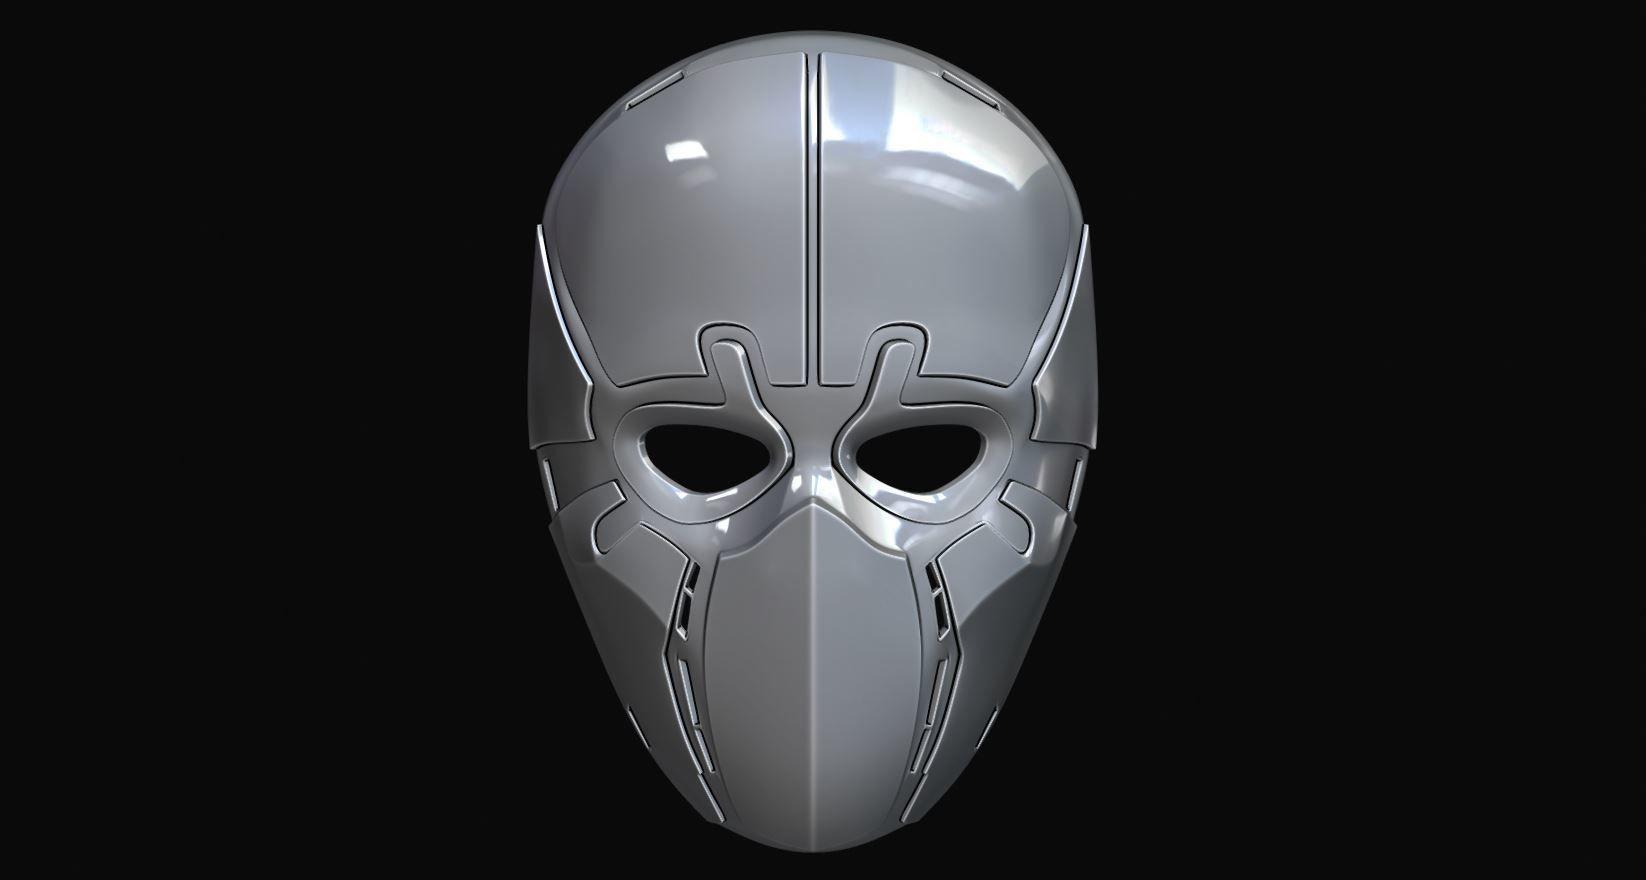 Gas mask helmet 3d model   CGTrader